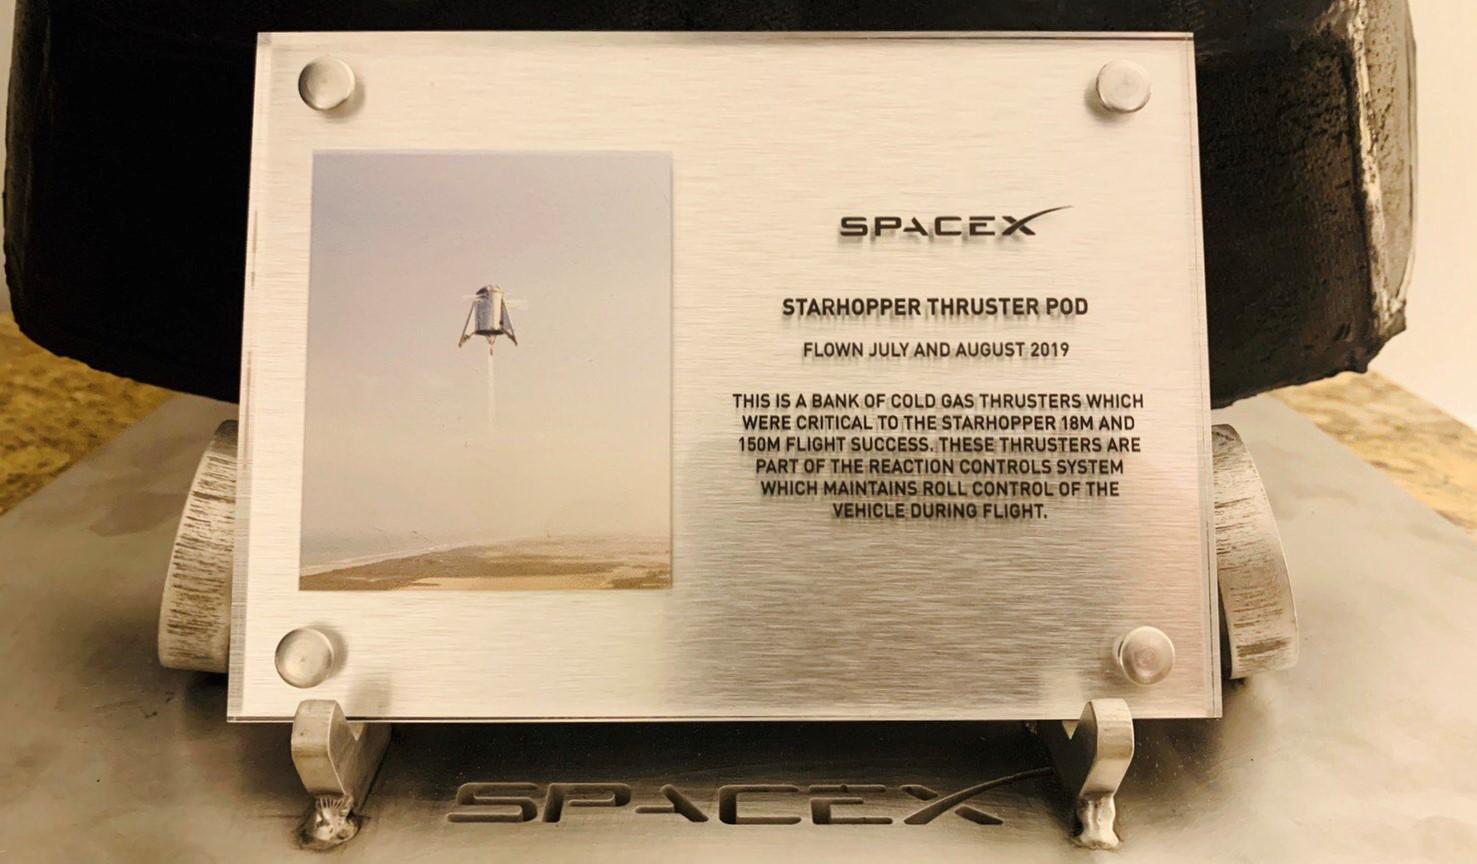 SpaceX Starhopper thruster pod Elon Musk gift (Yusaku Maezawa) 2 crop